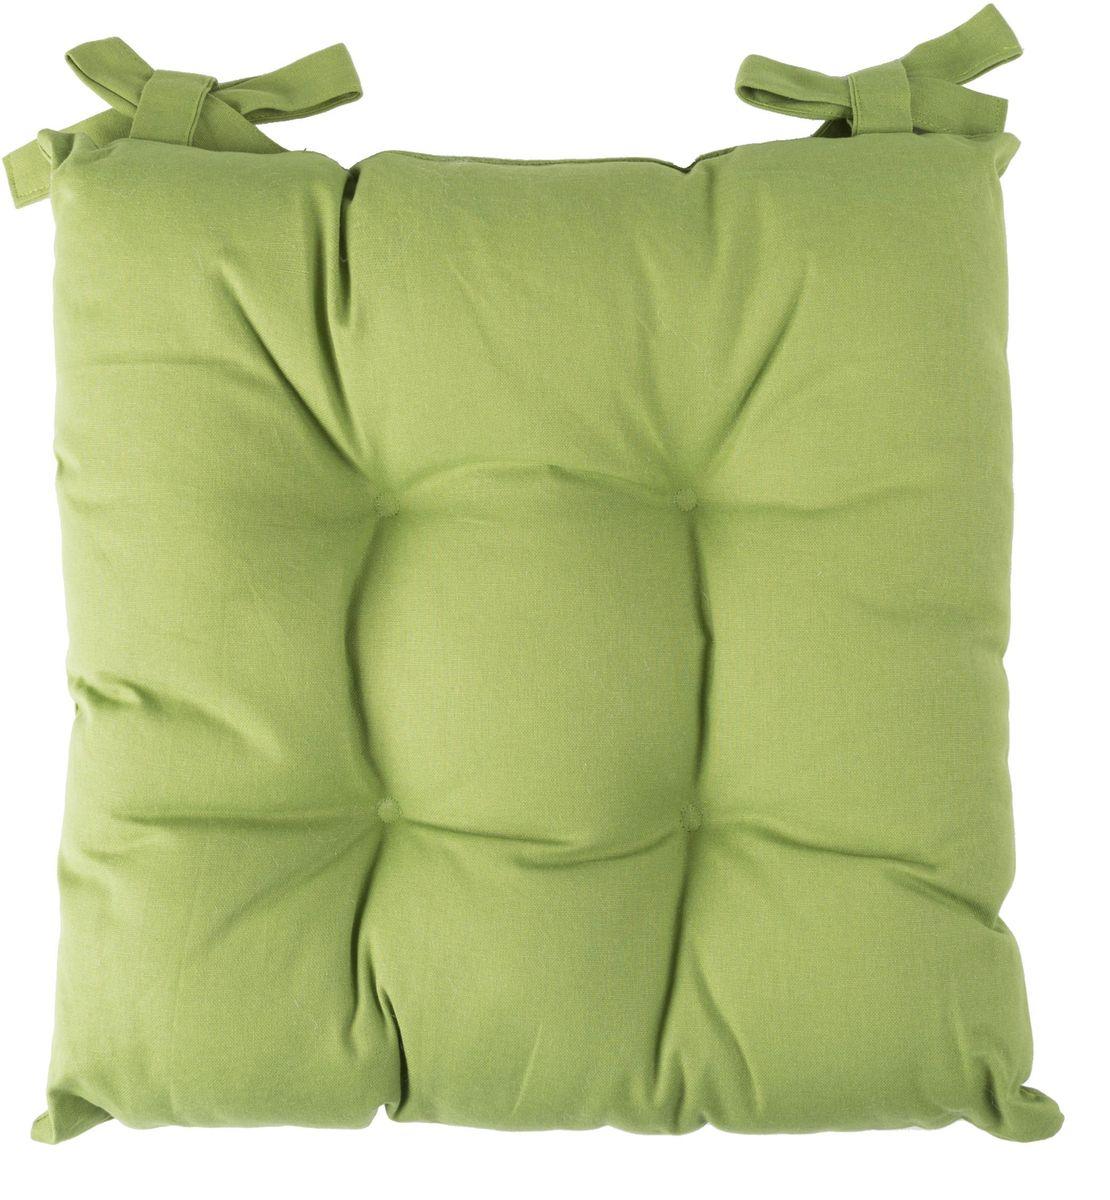 Подушка на стул Daily by T Каролина, цвет: салатовый, 45 х 45 см детские табуретки фото